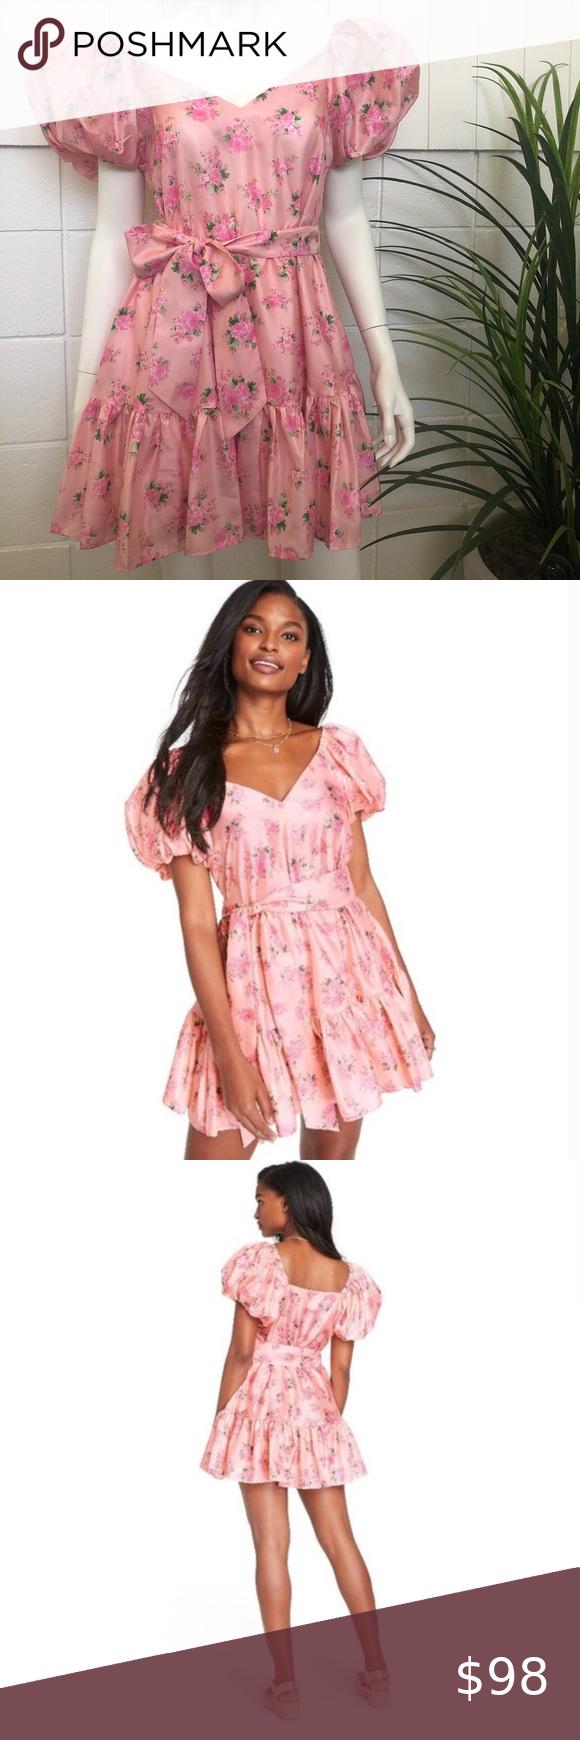 Loveshackfancy X Target Cecile Dress Nwt Pink Mini Dresses Dresses Puff Sleeve Dresses [ 1740 x 580 Pixel ]